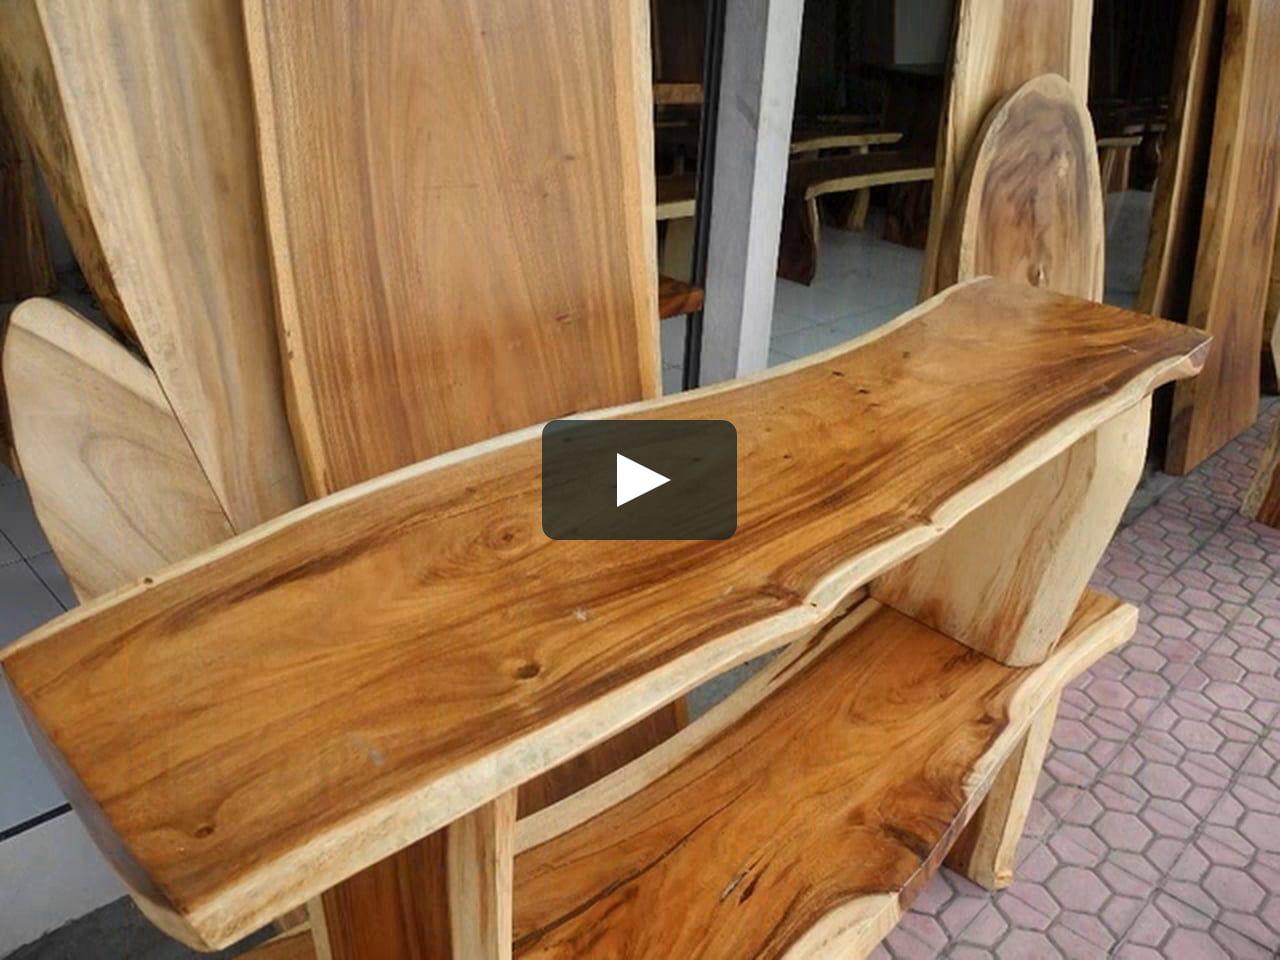 WOOD SLAB TABLE TOPS Wood slab table, Wood slab, Wood